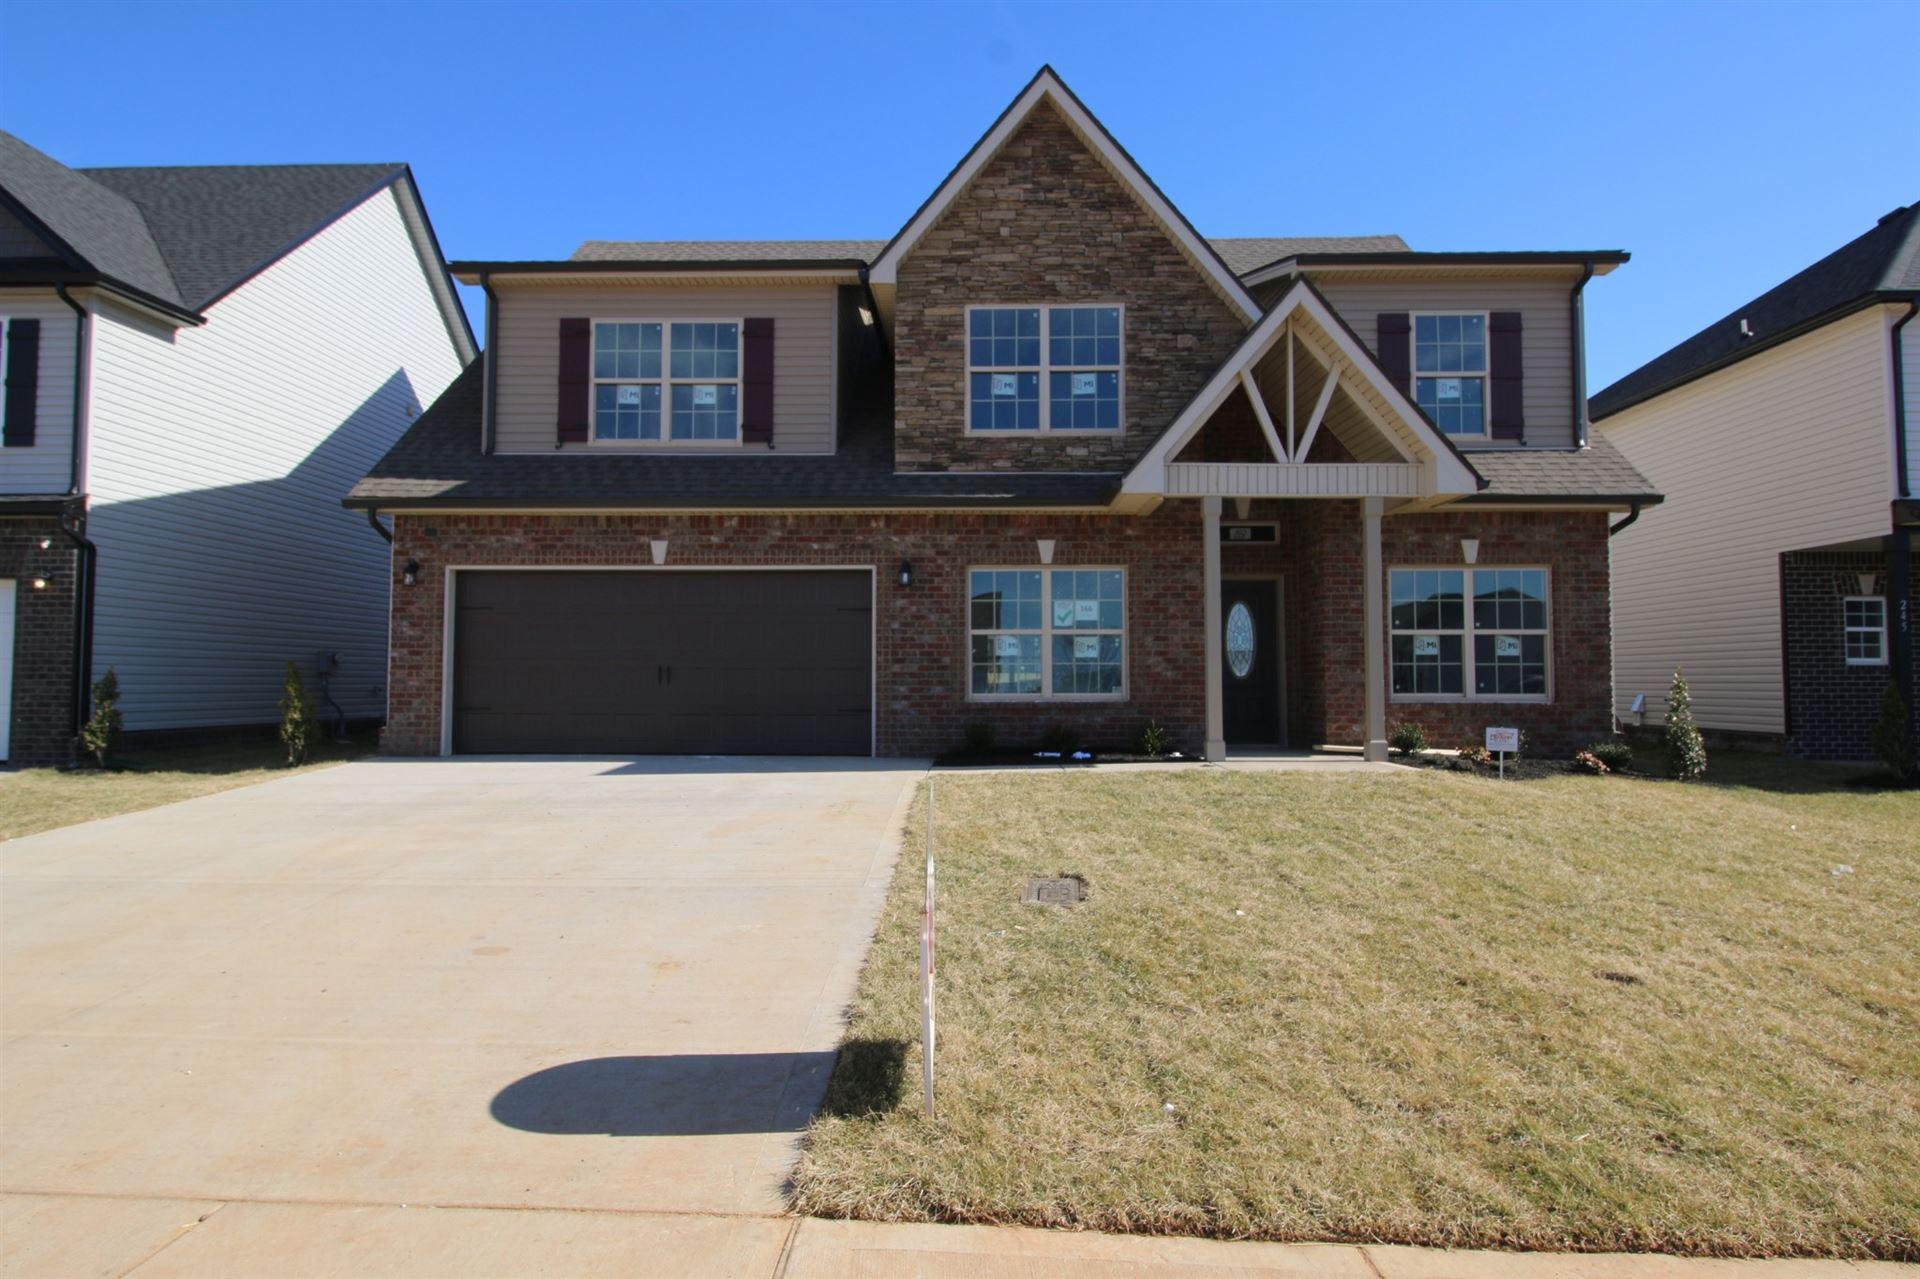 166 Mills Creek, Clarksville, TN 37042 - MLS#: 2297280